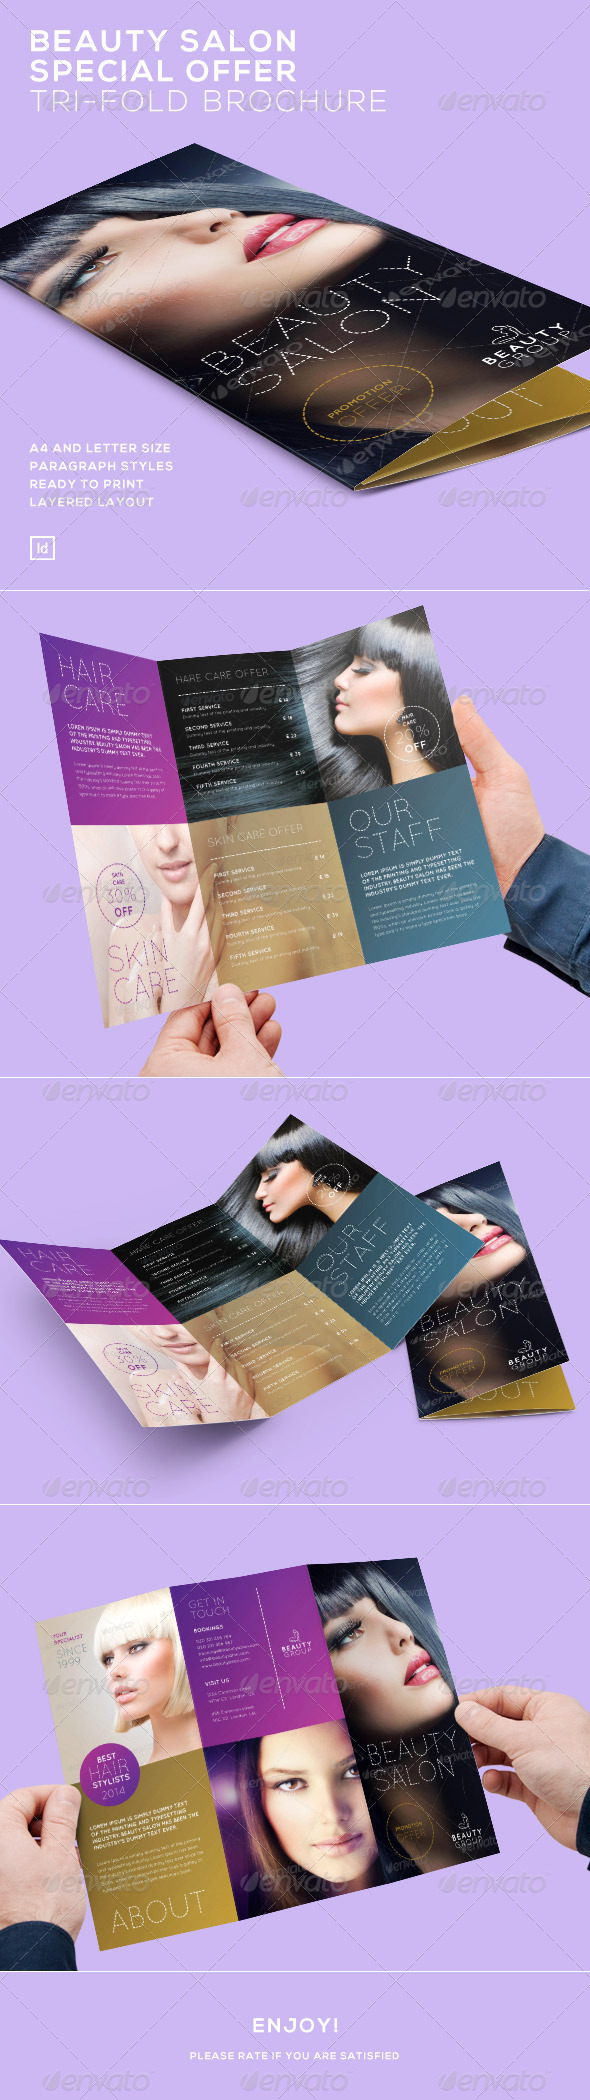 Beauty Salon Special Offer - Tri-Fold Brochure - Brochures Print Templates